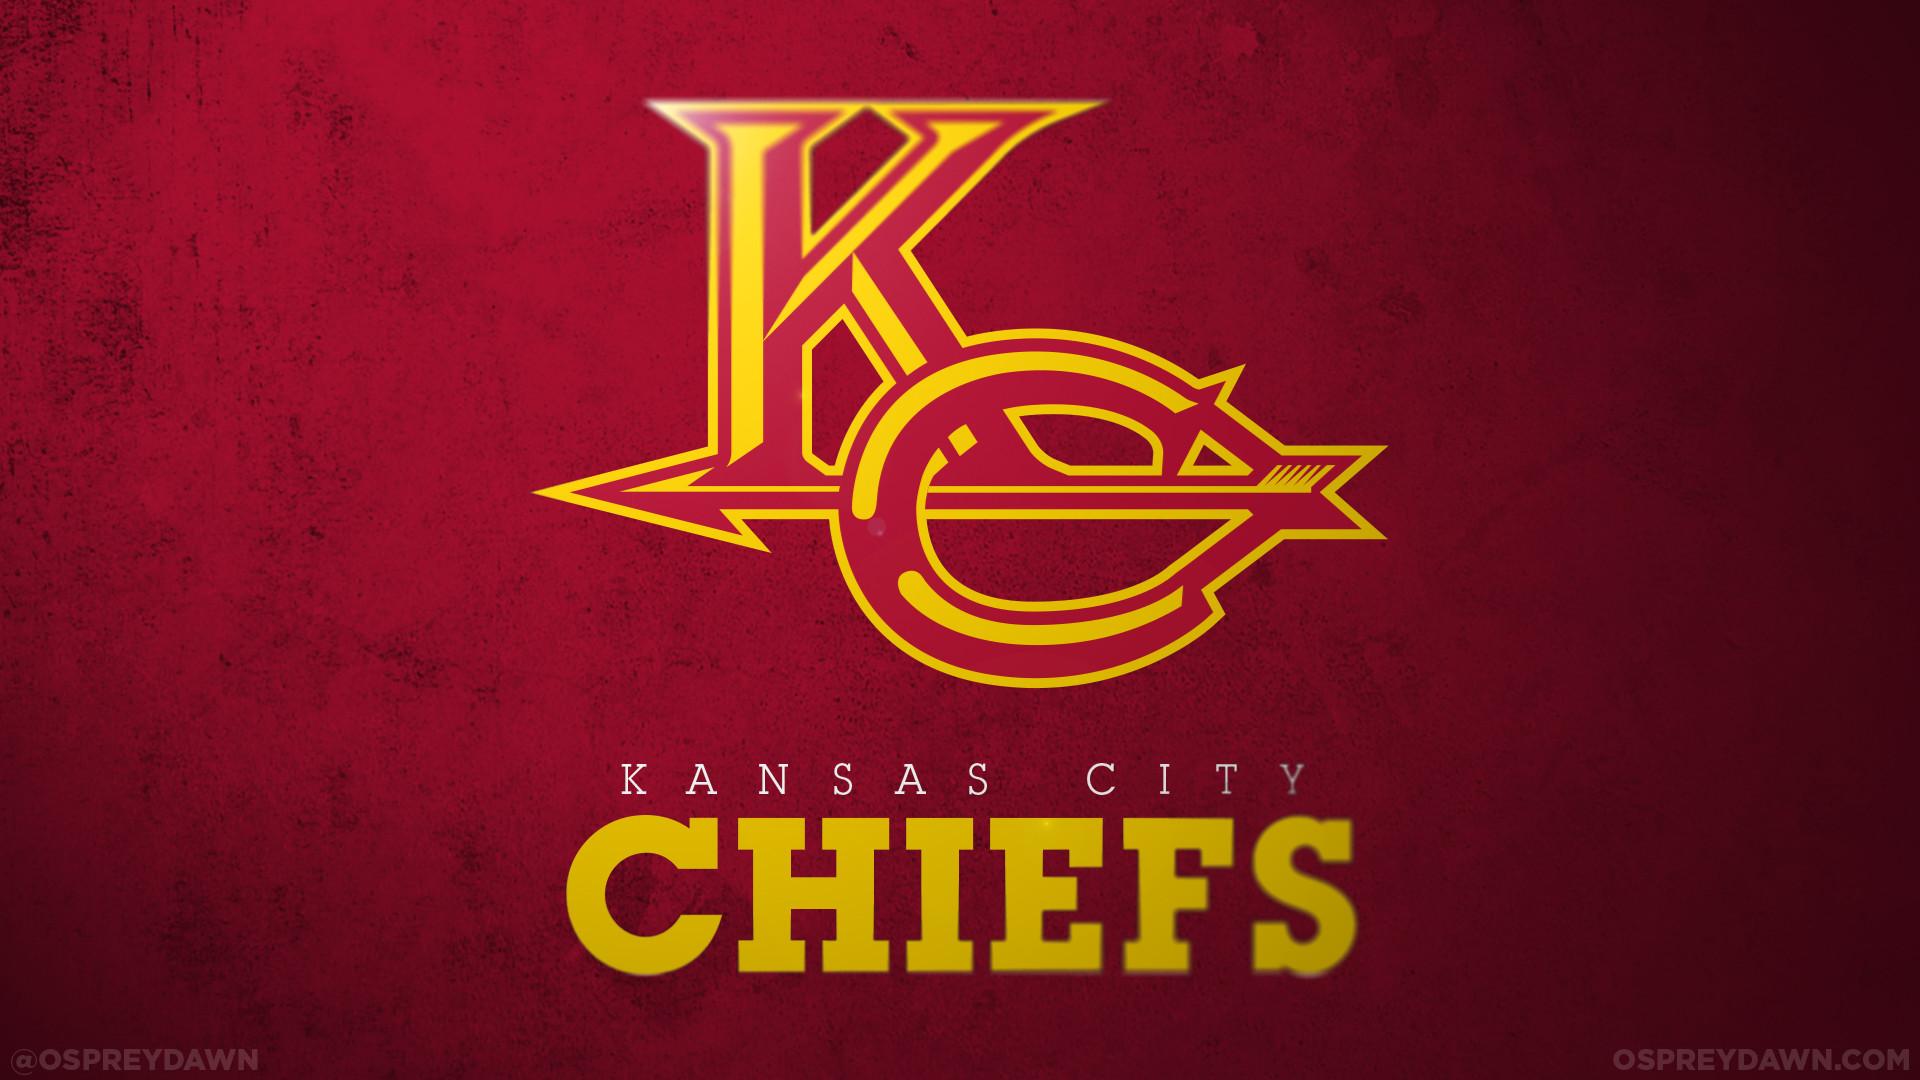 Kansas City Chiefs Football Team Logo. New York Giants …